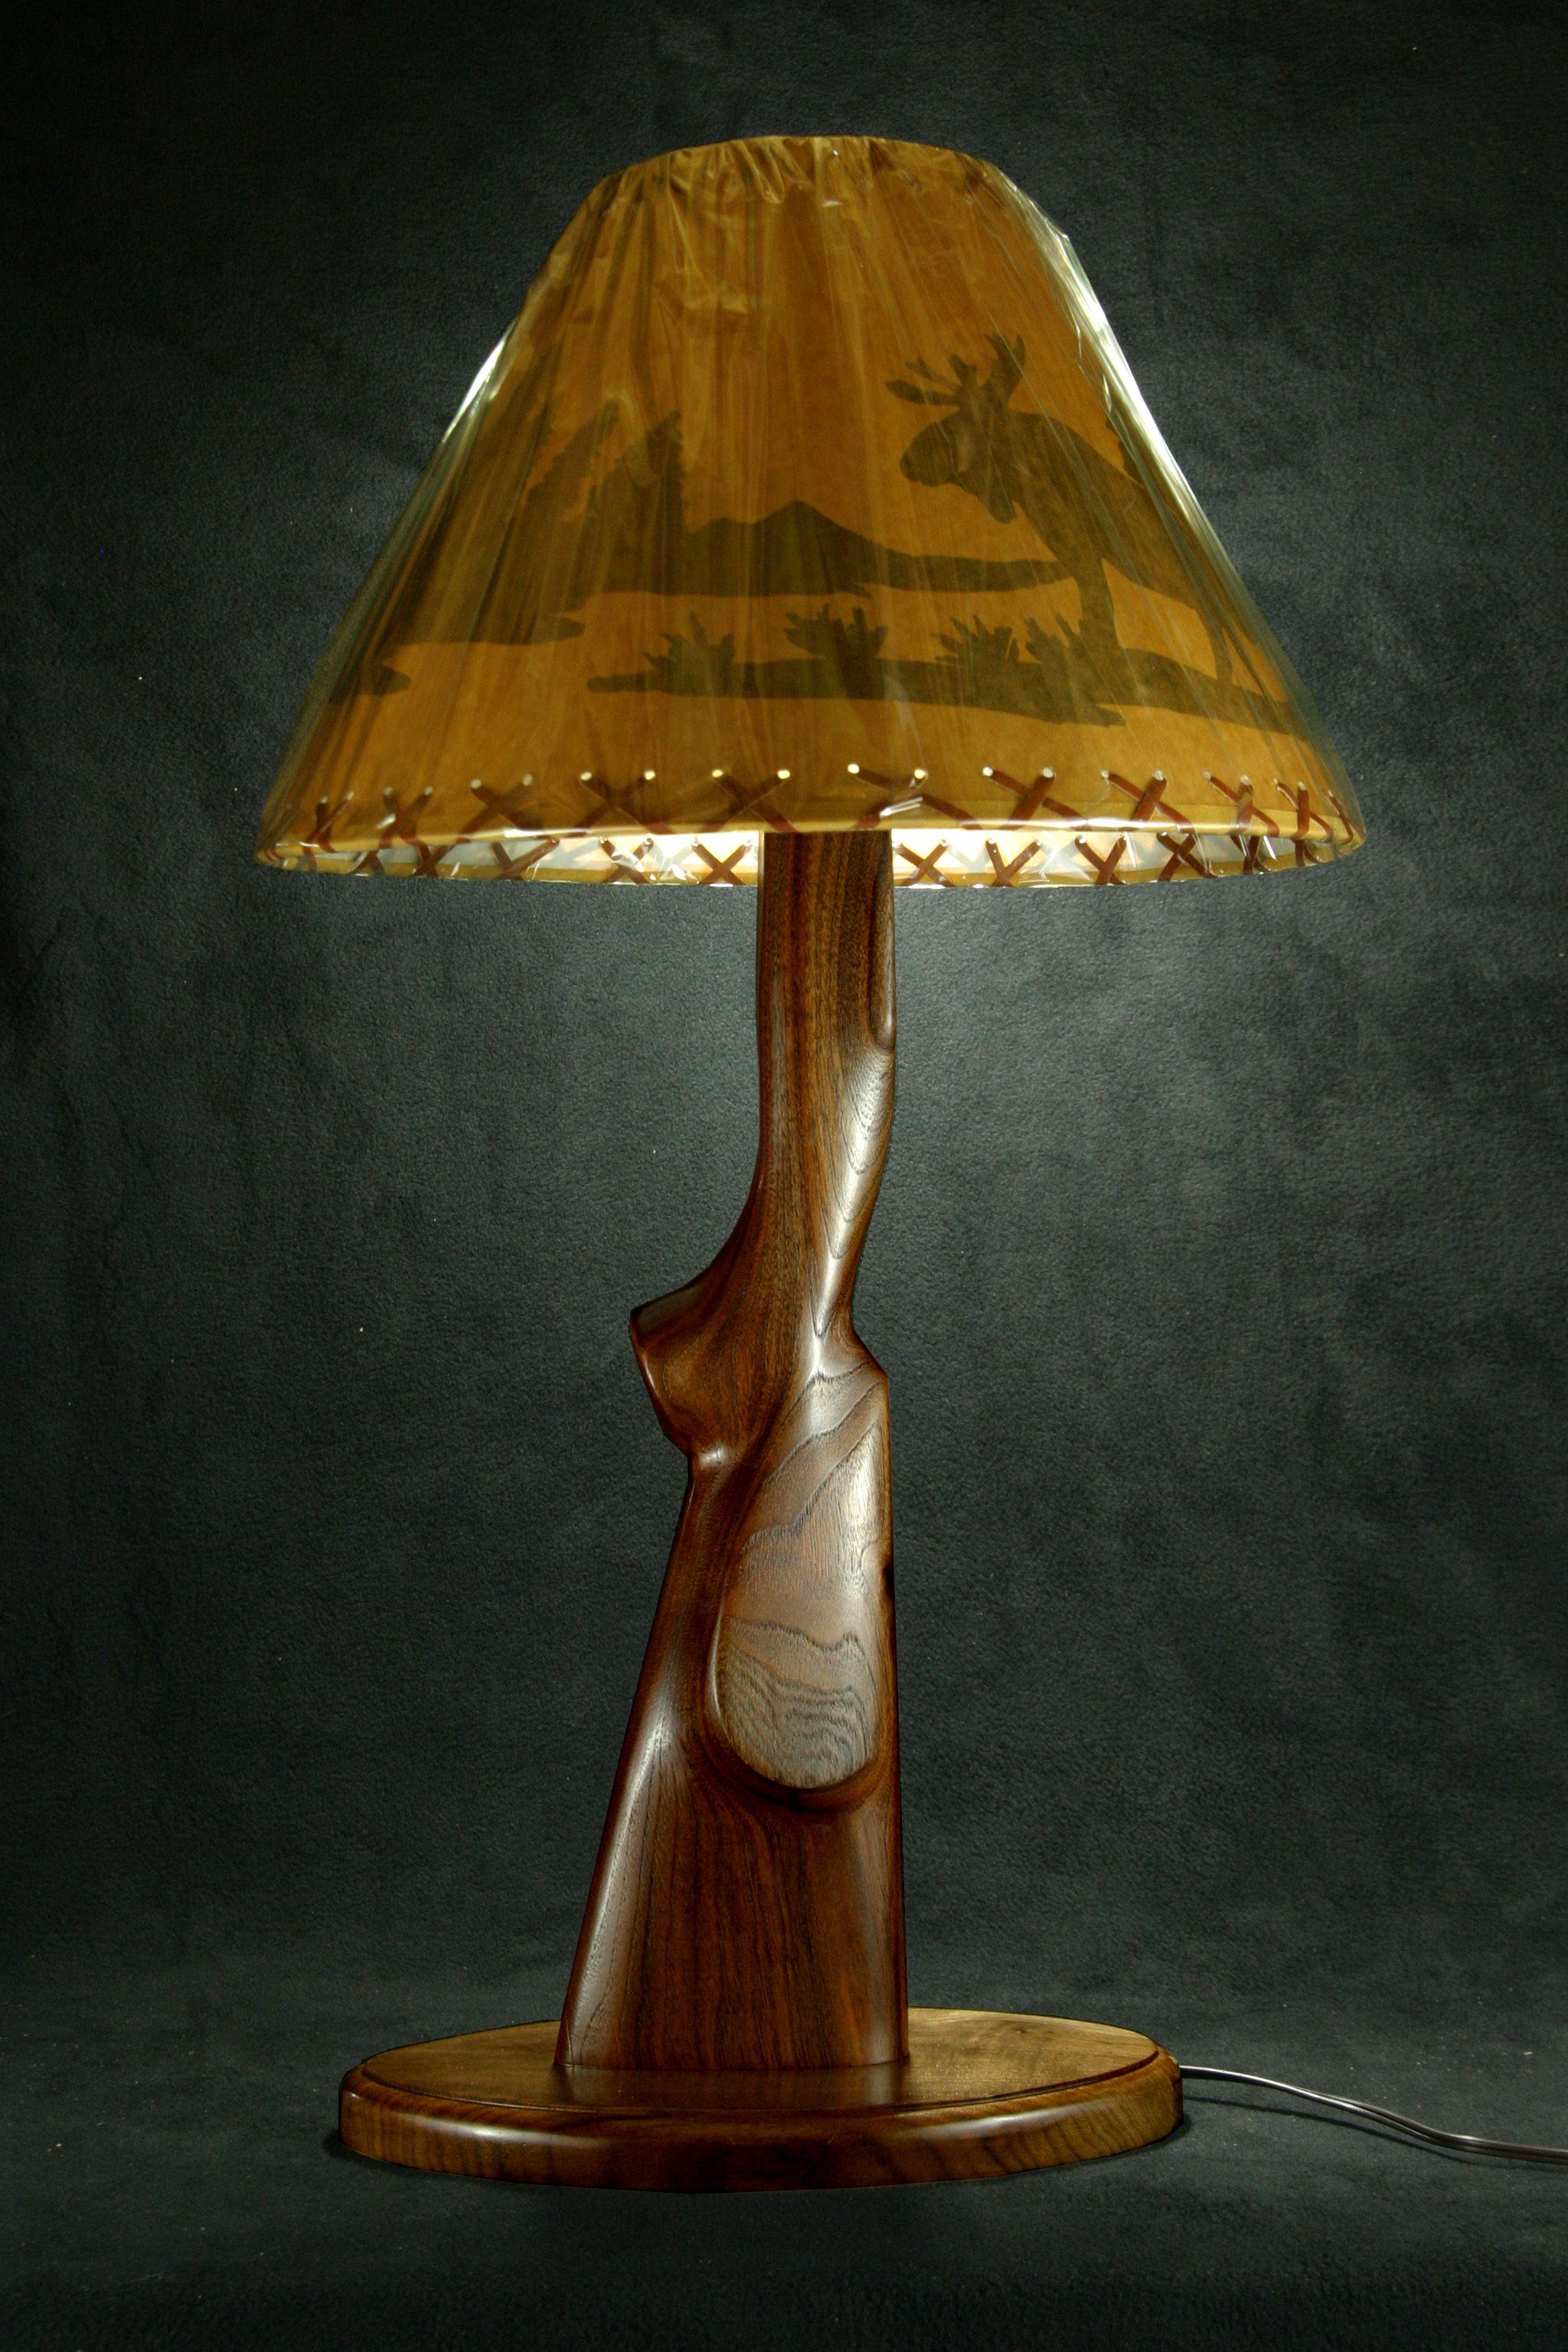 Walnut gun stock lamp